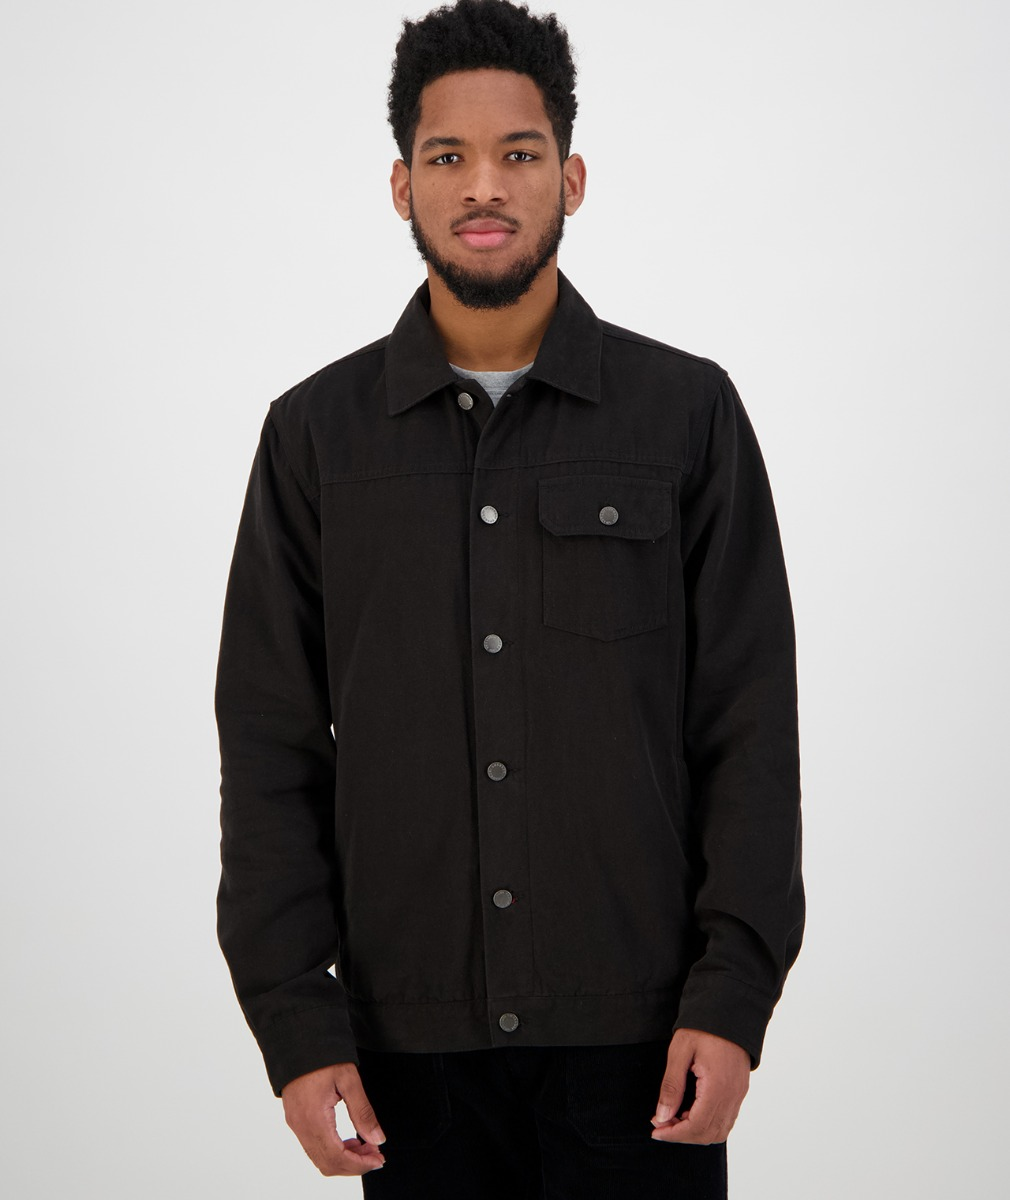 Swanndri Men's Fox River Trucker Jacket in Black